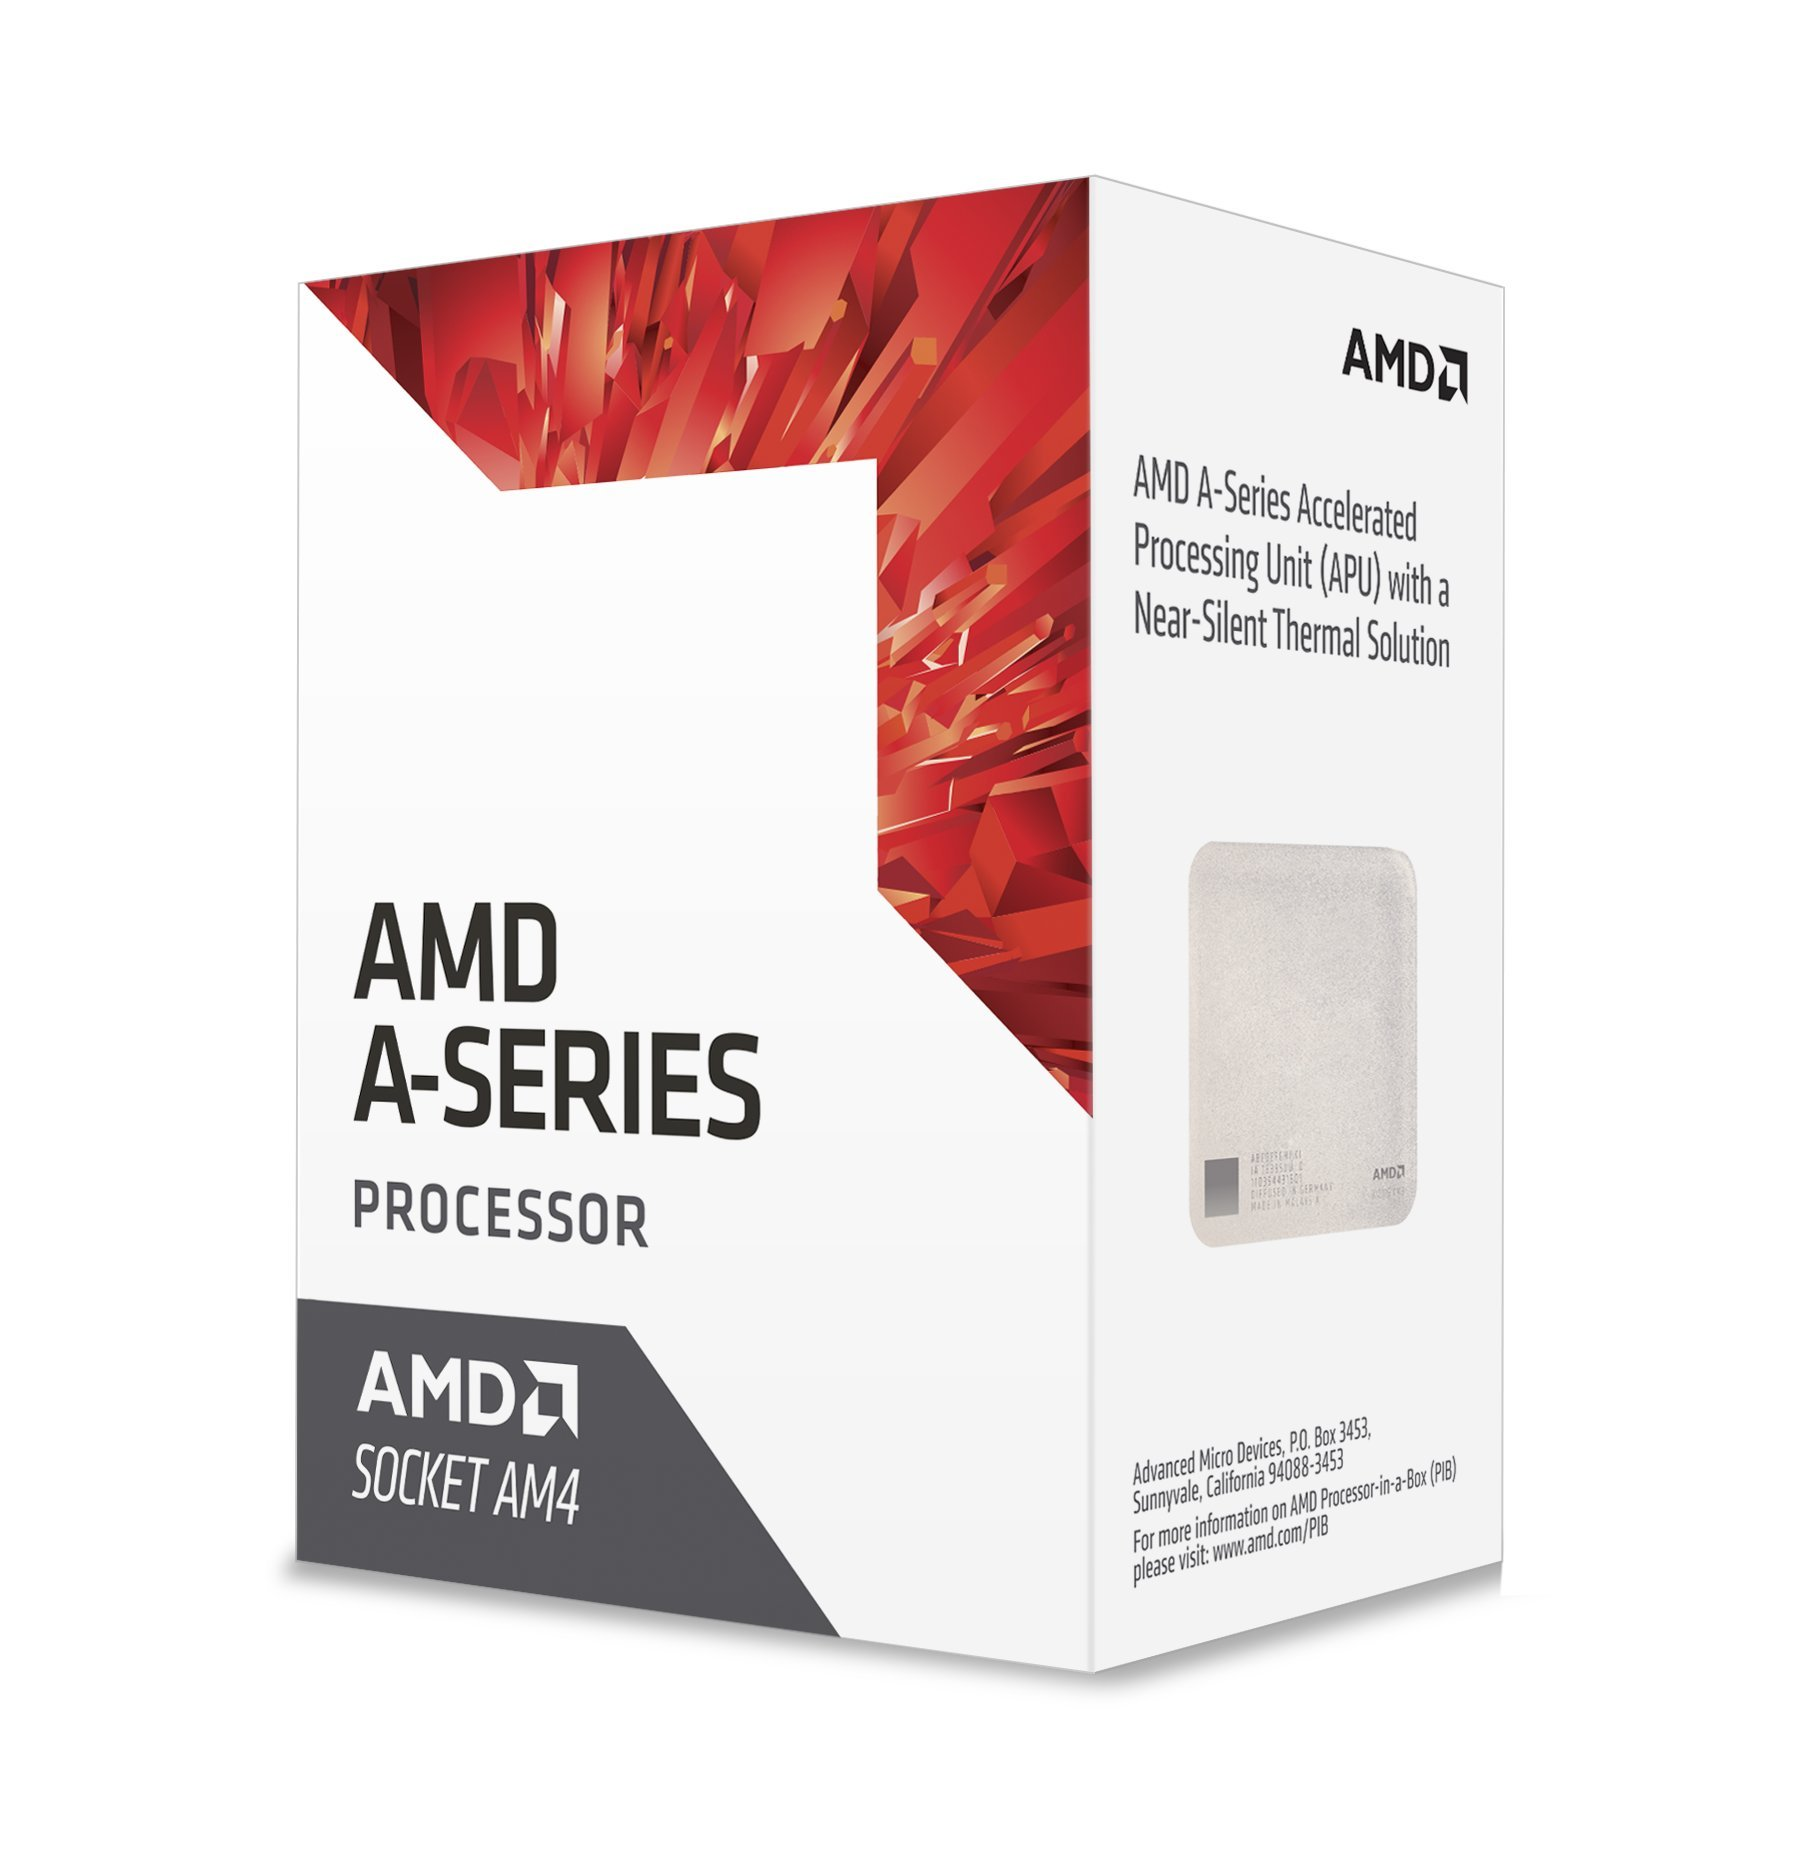 AMD Athlon X4 950 Quad-core (4 Core) 3.50 GHz Processor - Socket AM4Retail Pack